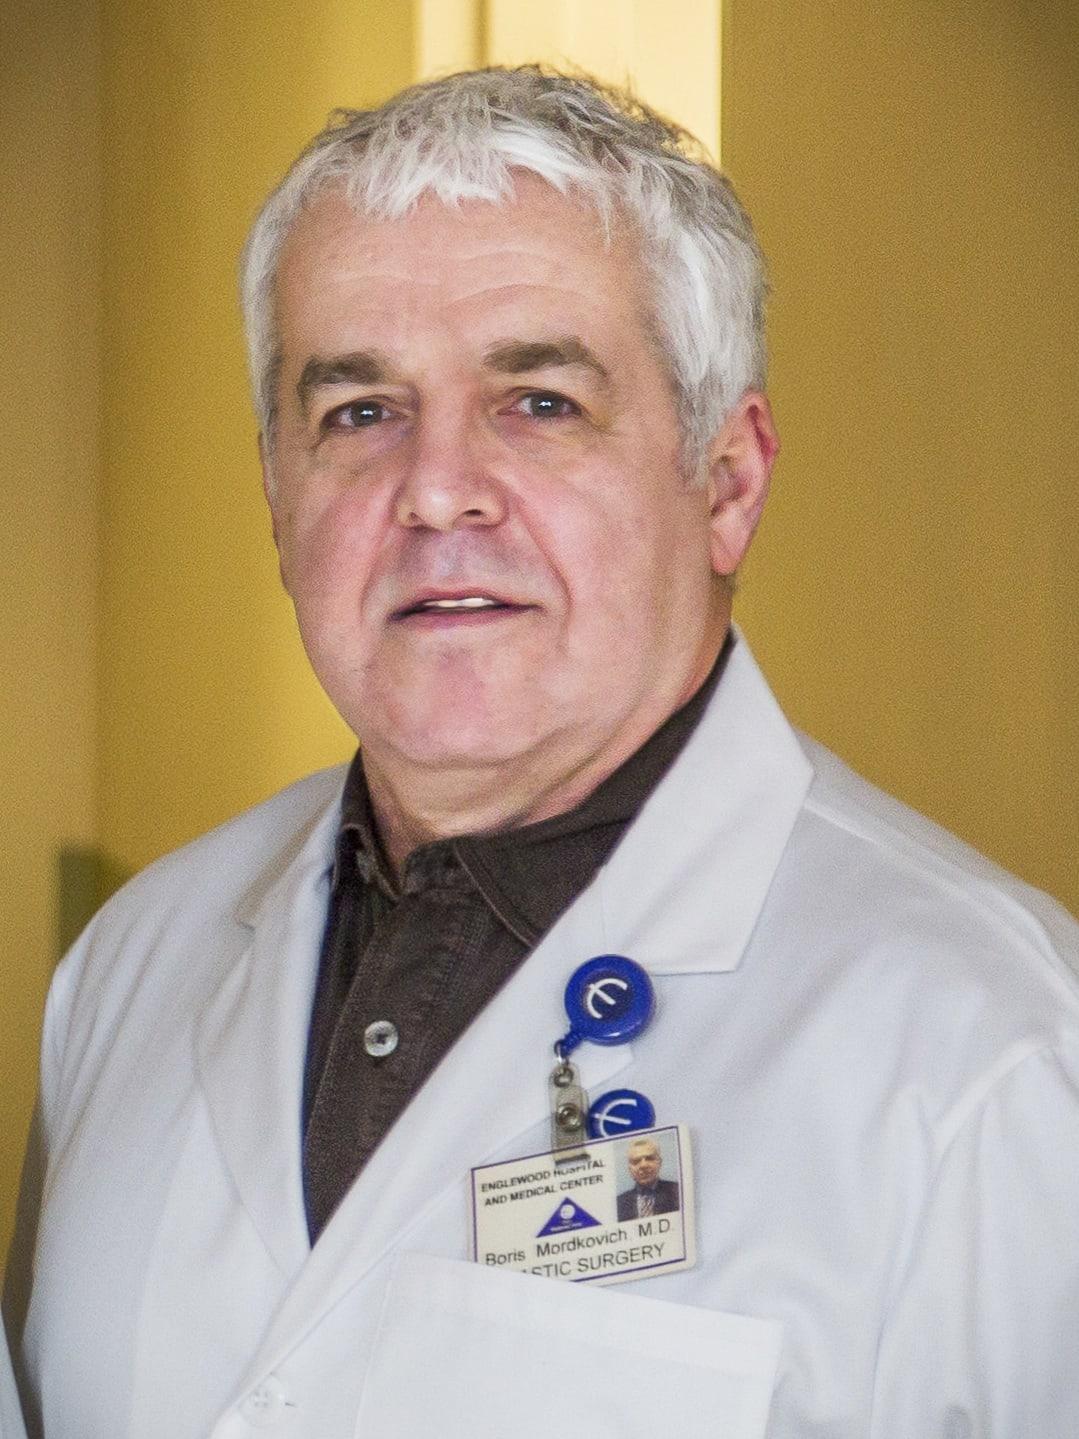 Boris Mordkovich, MD Surgery